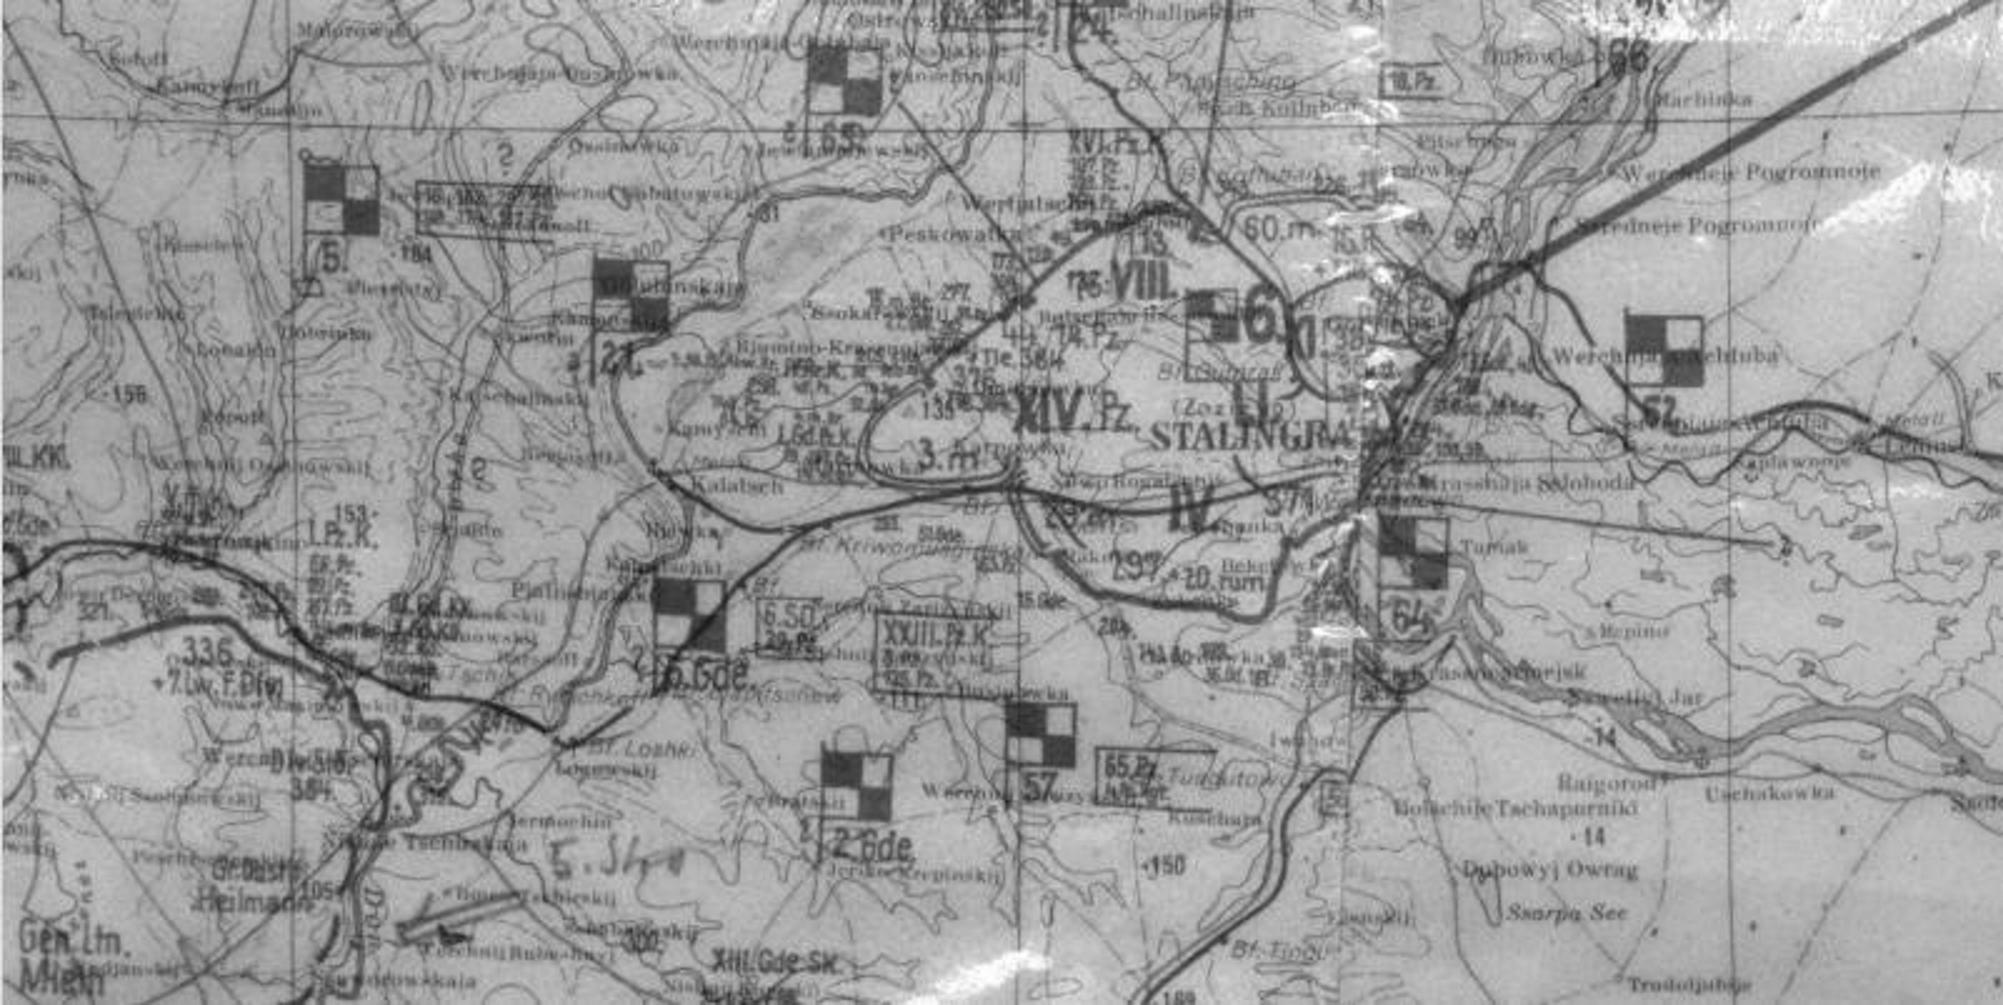 Ramelle France Map.Steam Workshop Maps Of Heroes 2